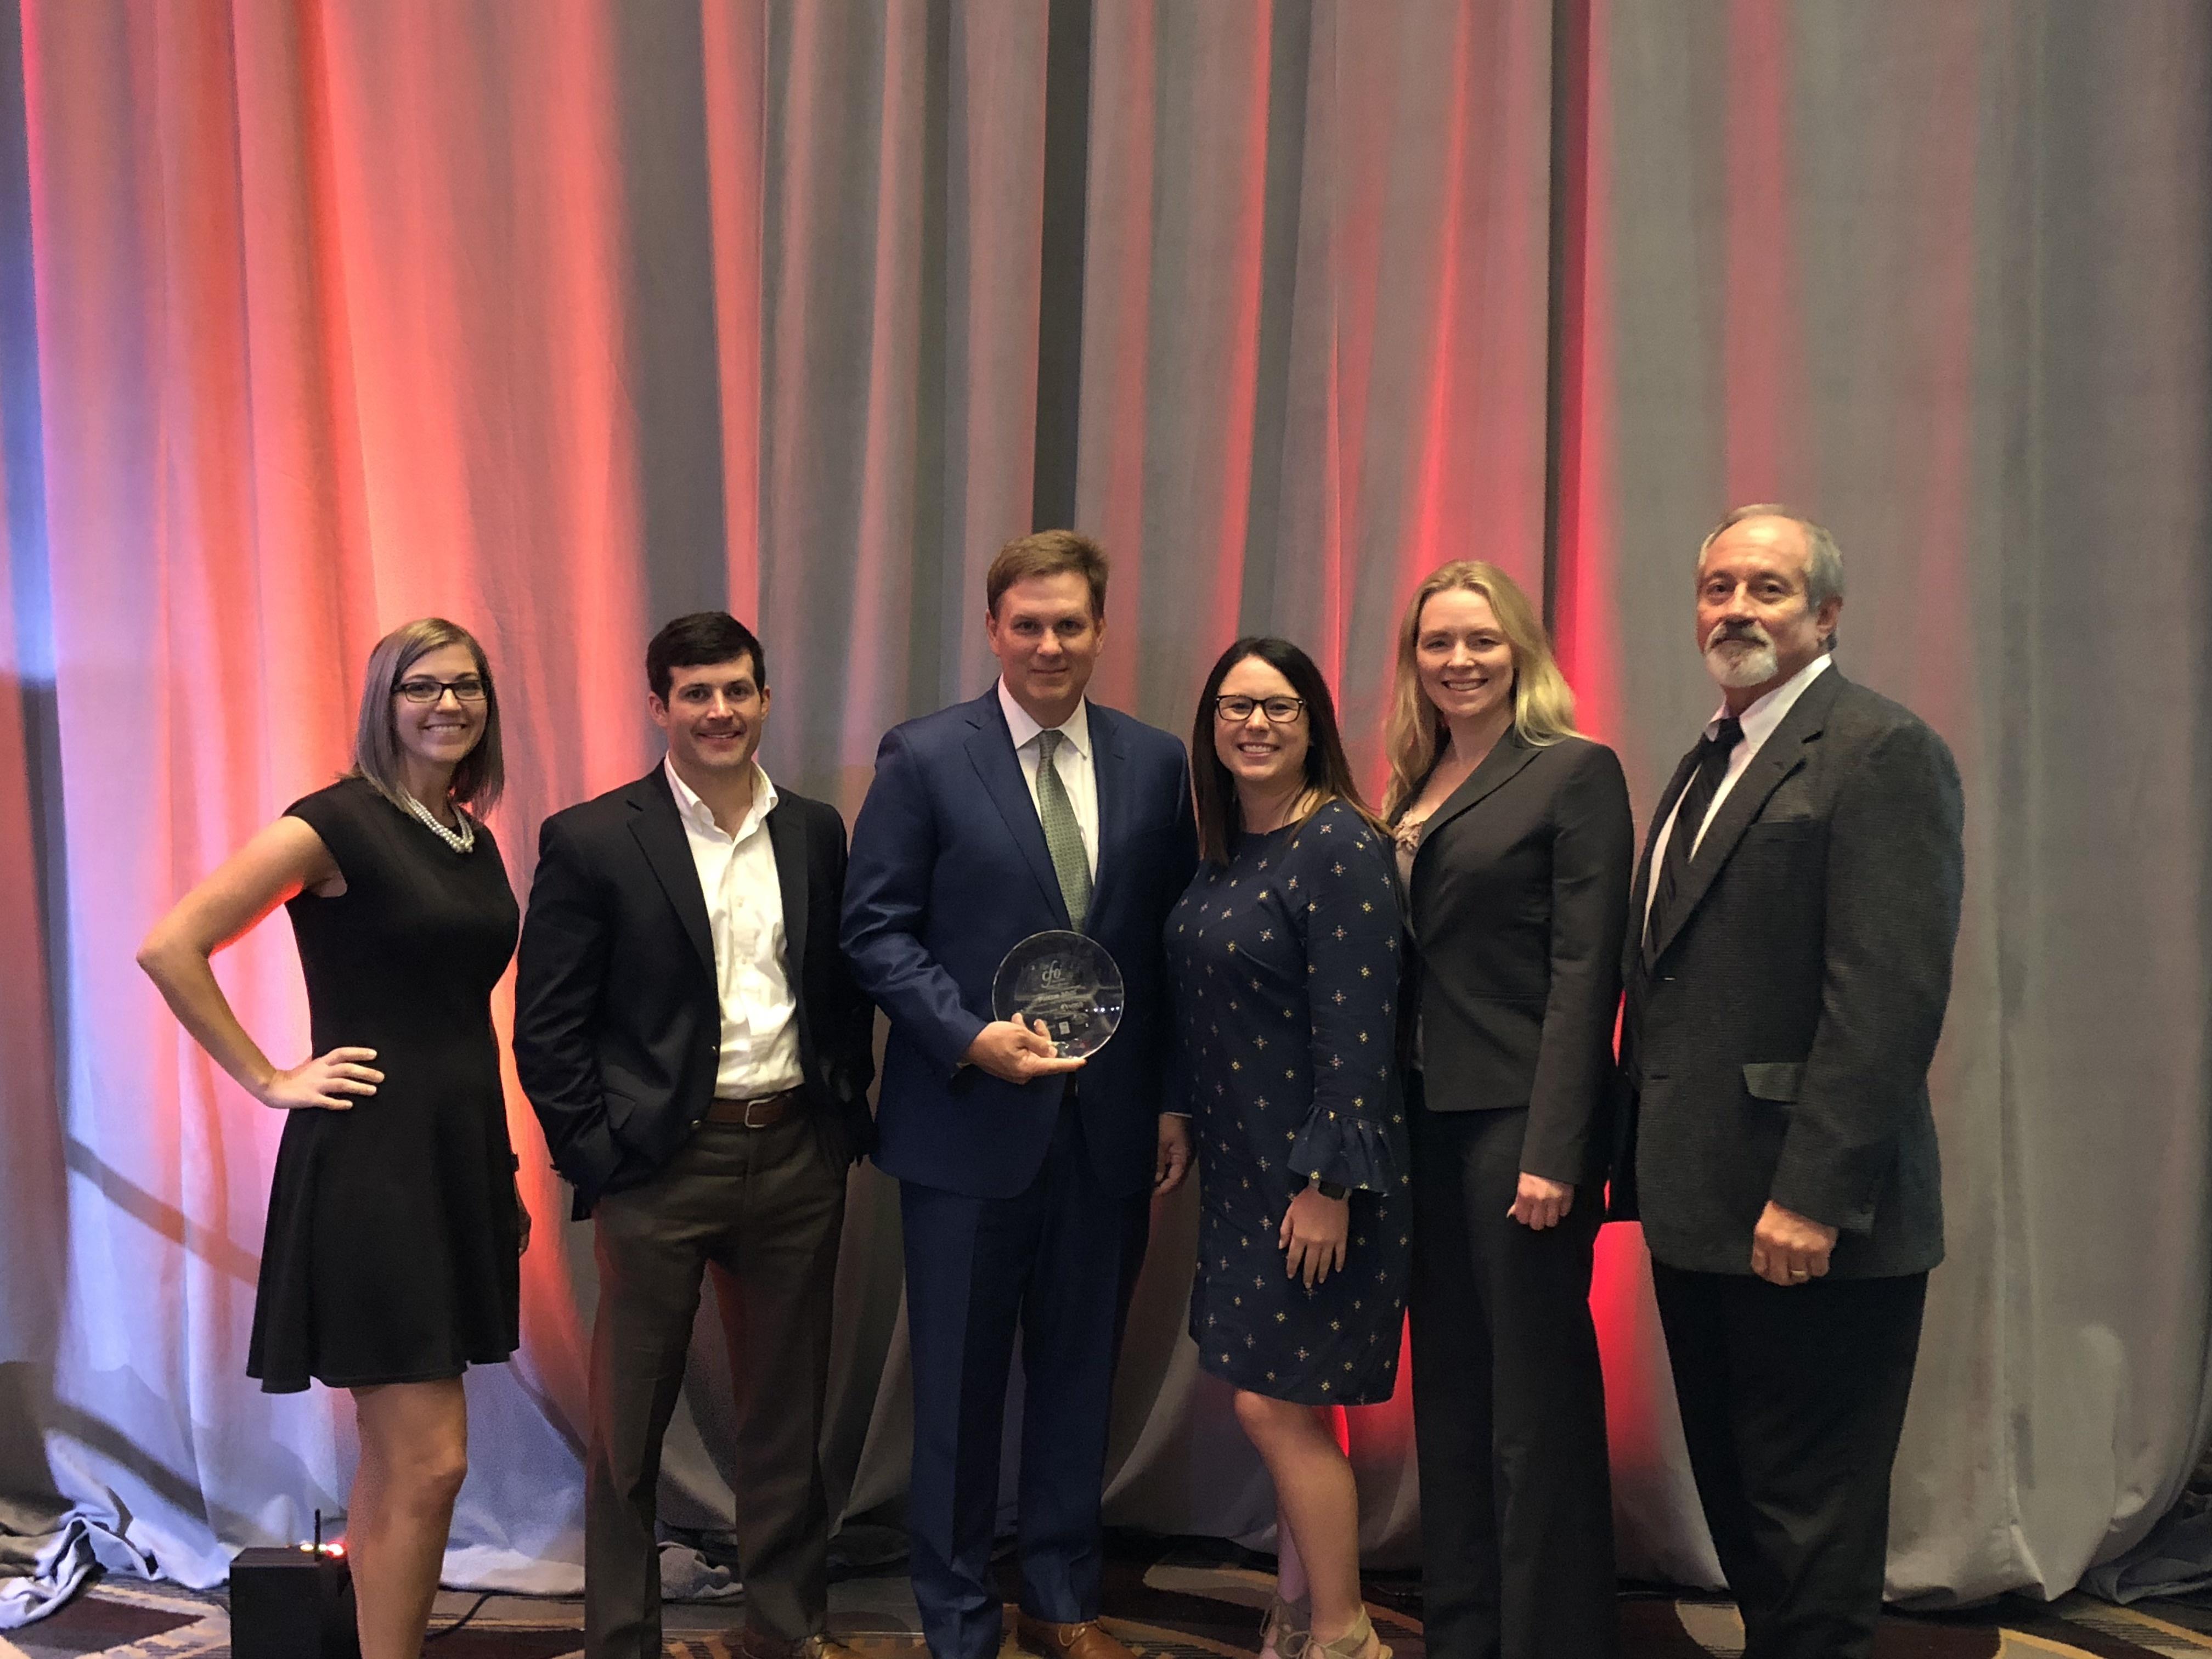 Phillip Mize Honored With Nashville Business Journal S 2018 Cfo Award